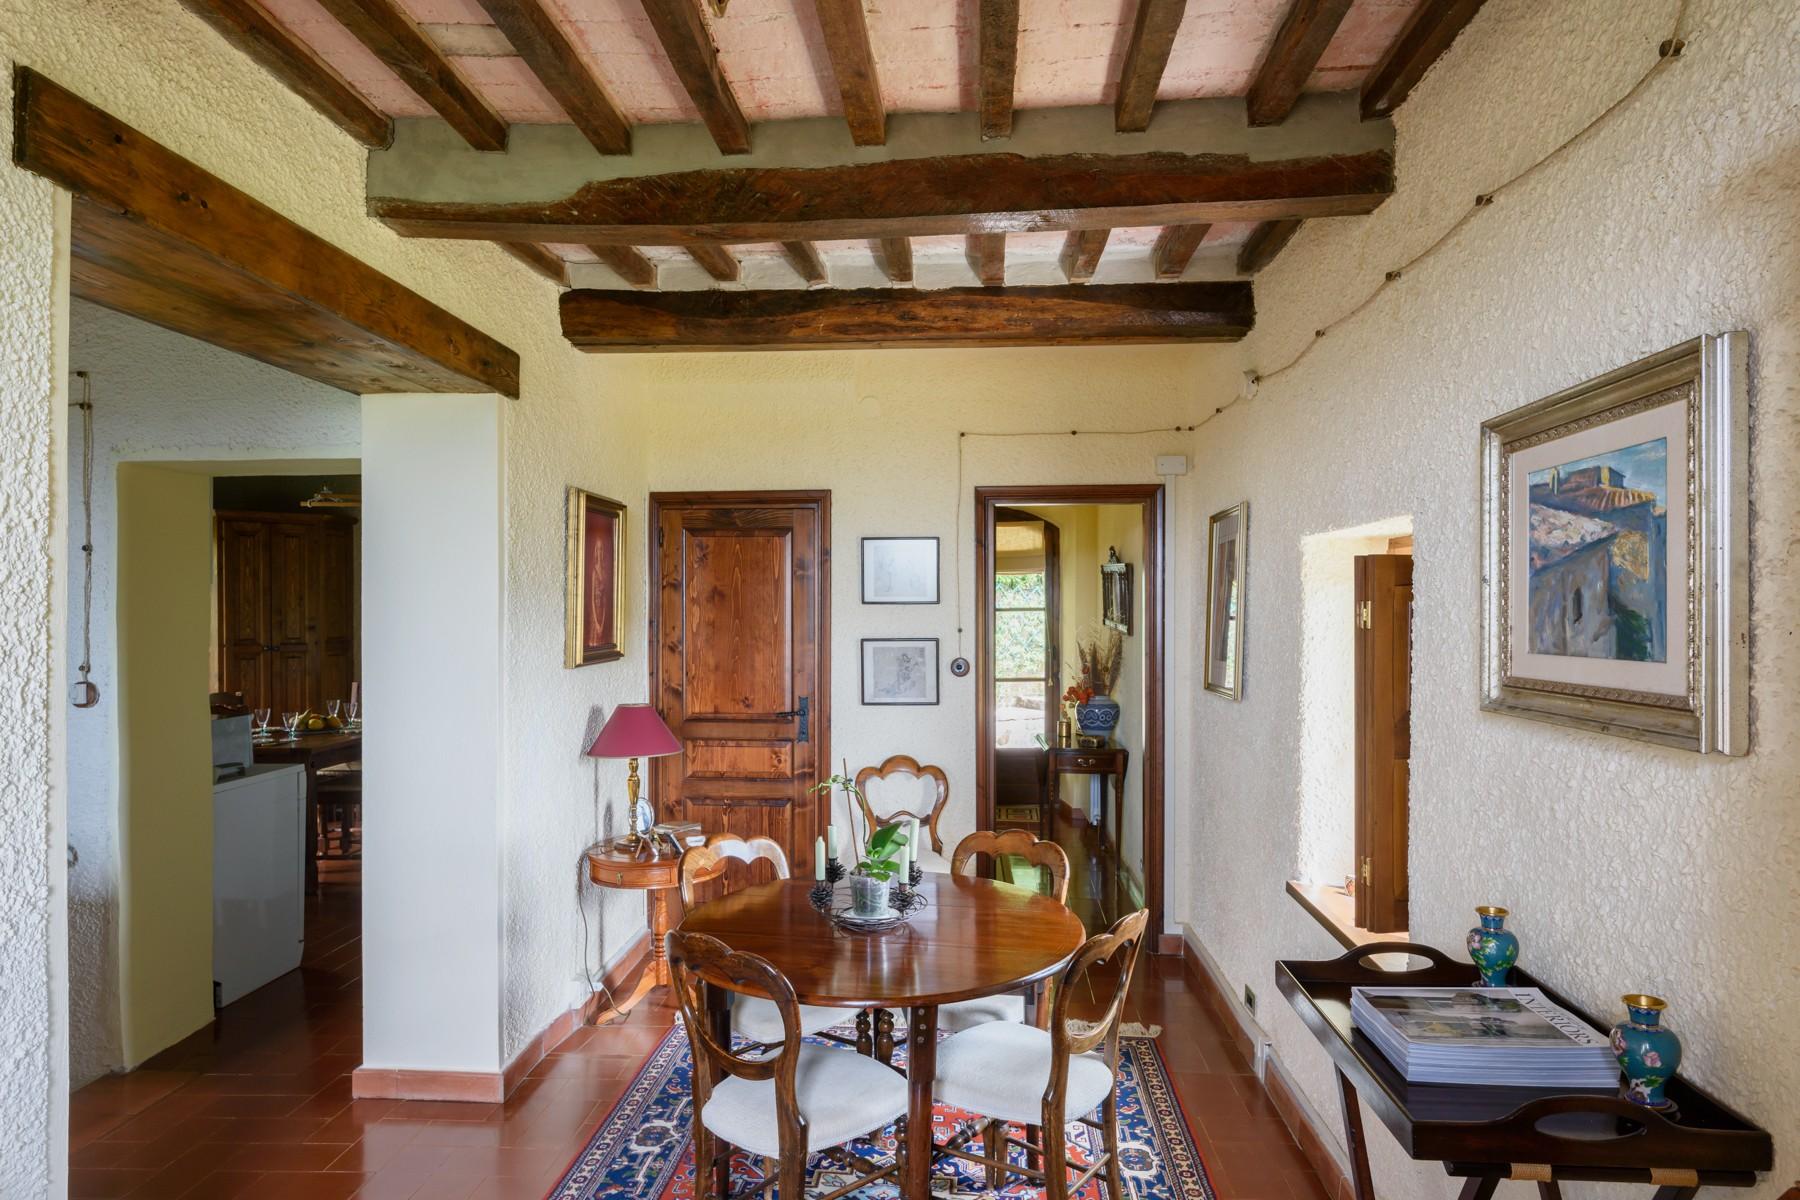 Casa indipendente in Vendita a Semproniano: 4 locali, 220 mq - Foto 8